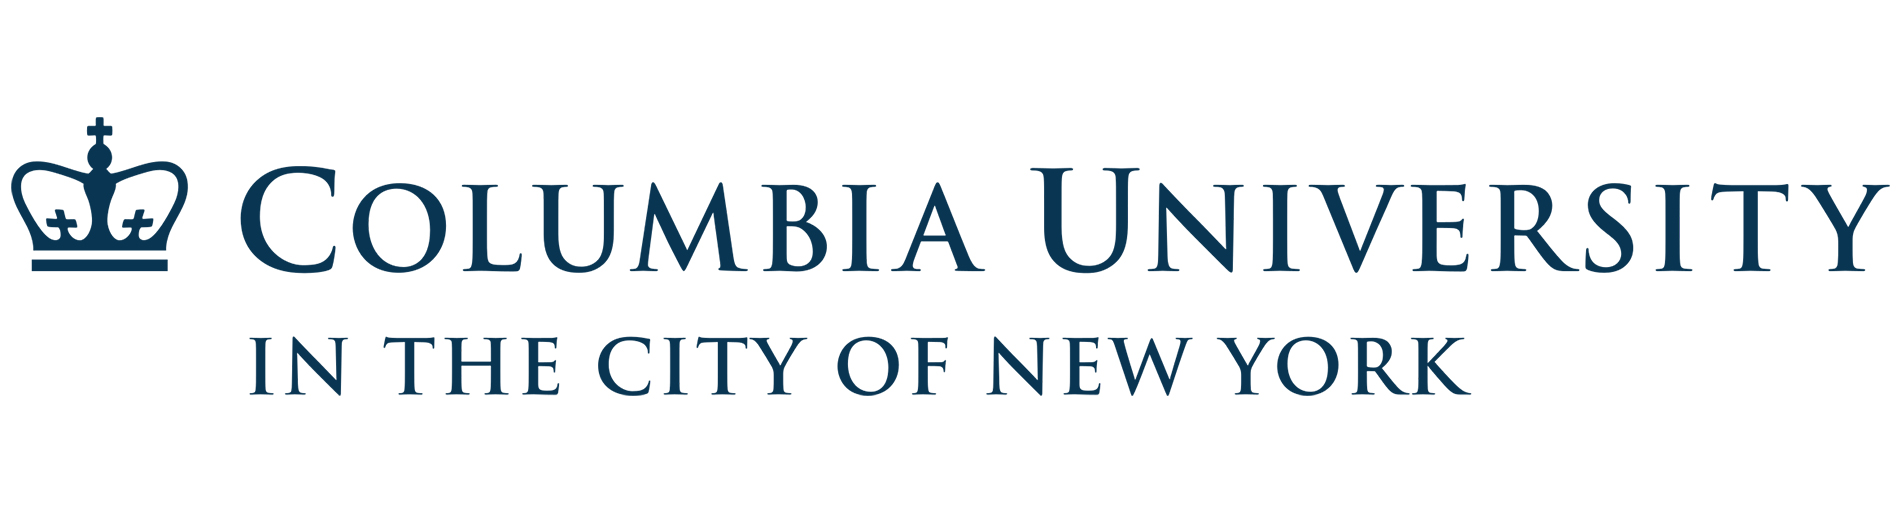 Columbia University Logo Cambridge Online South Africa